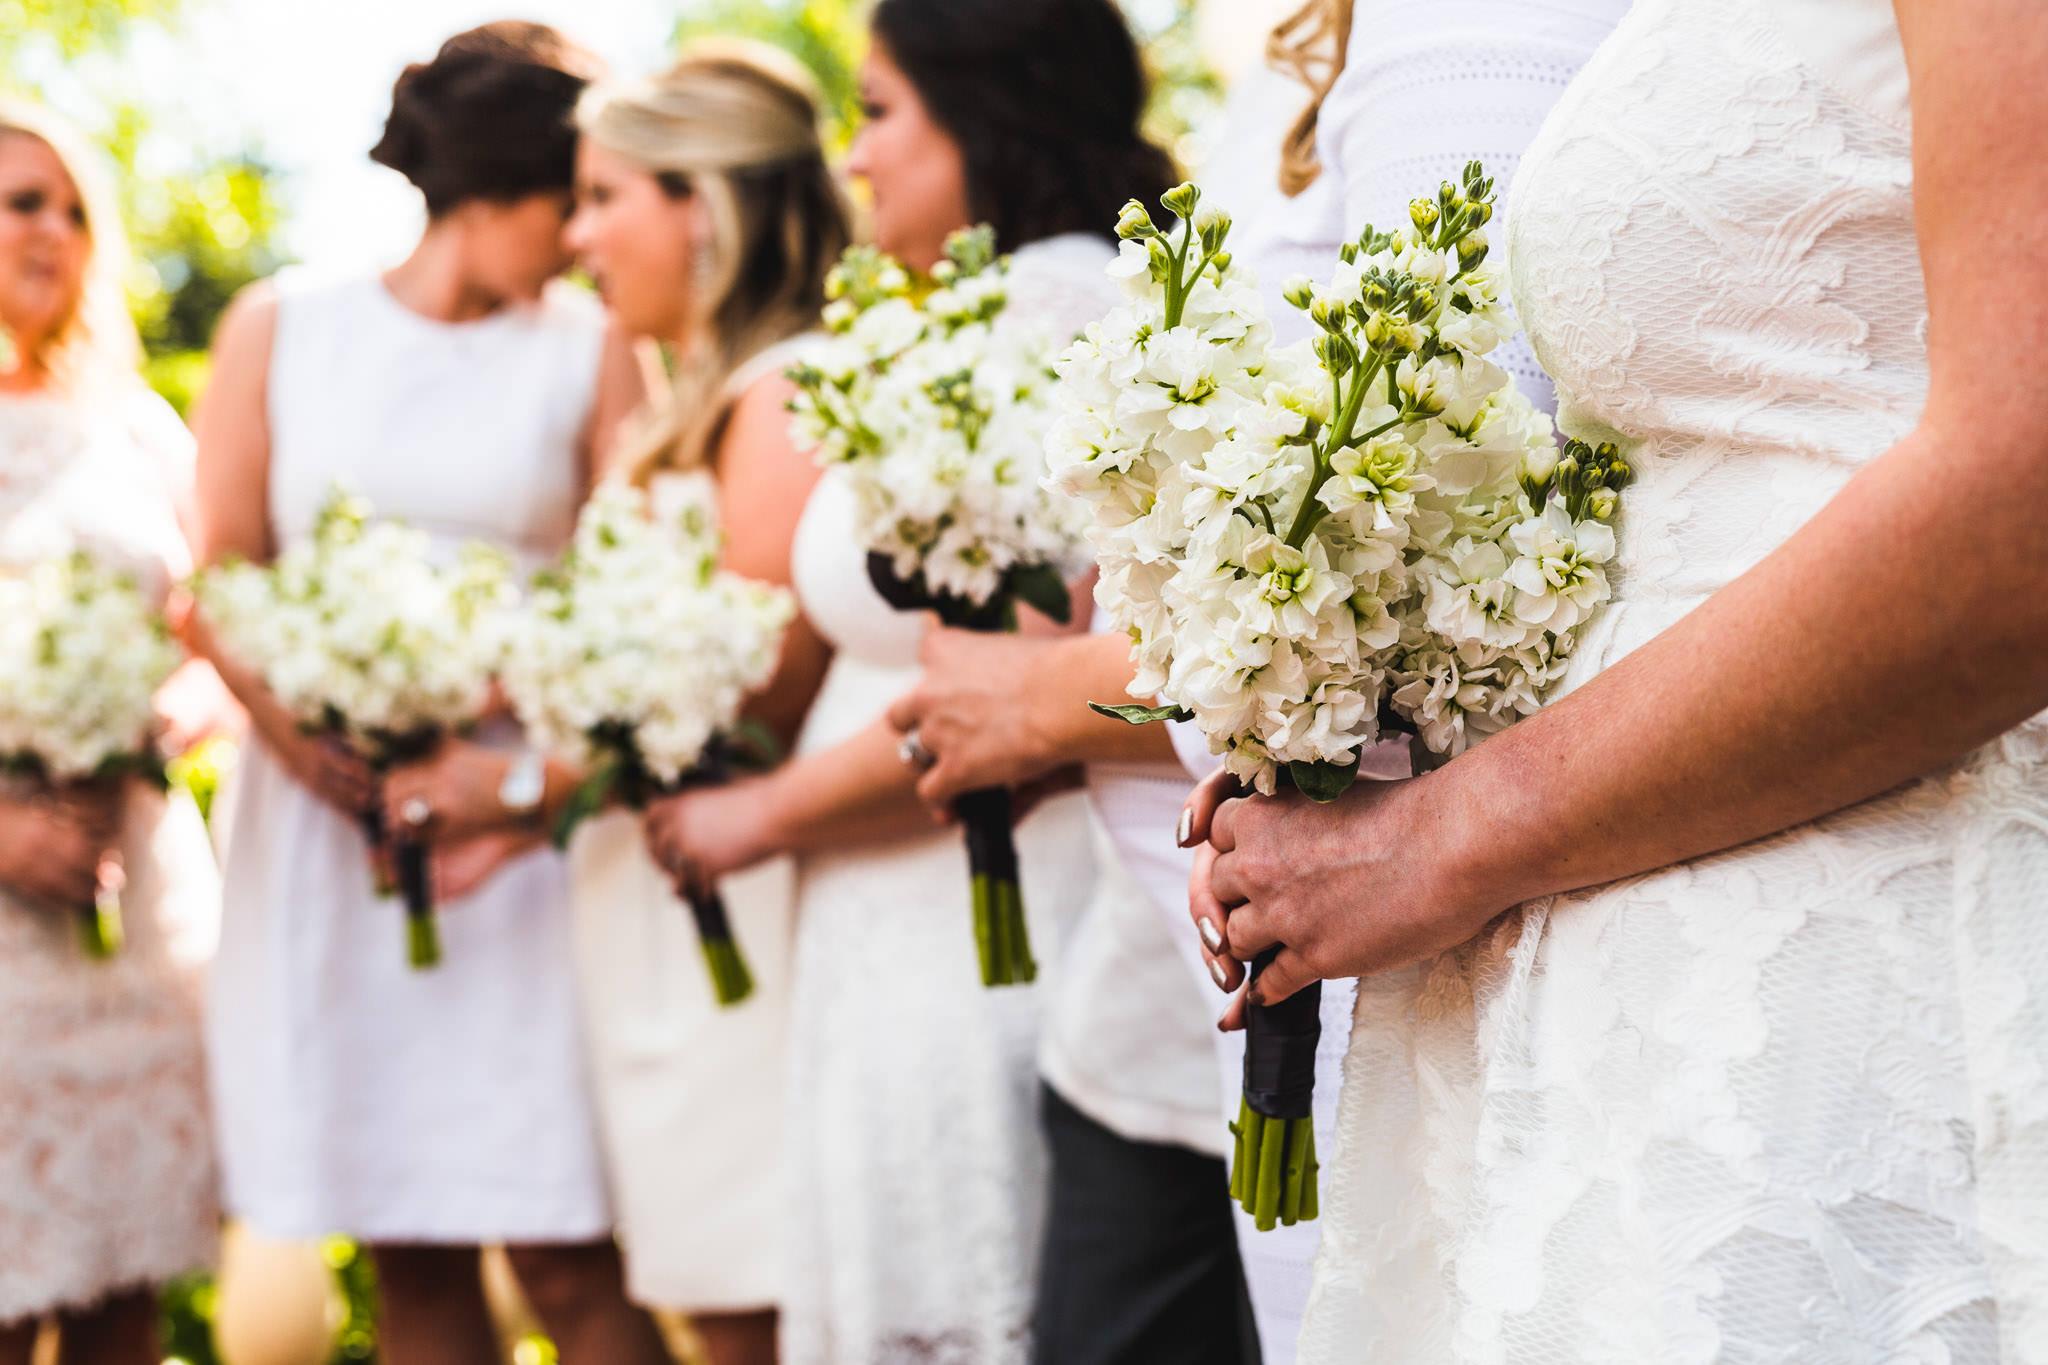 st-louis-photographer-backyard-wedding-5.jpg